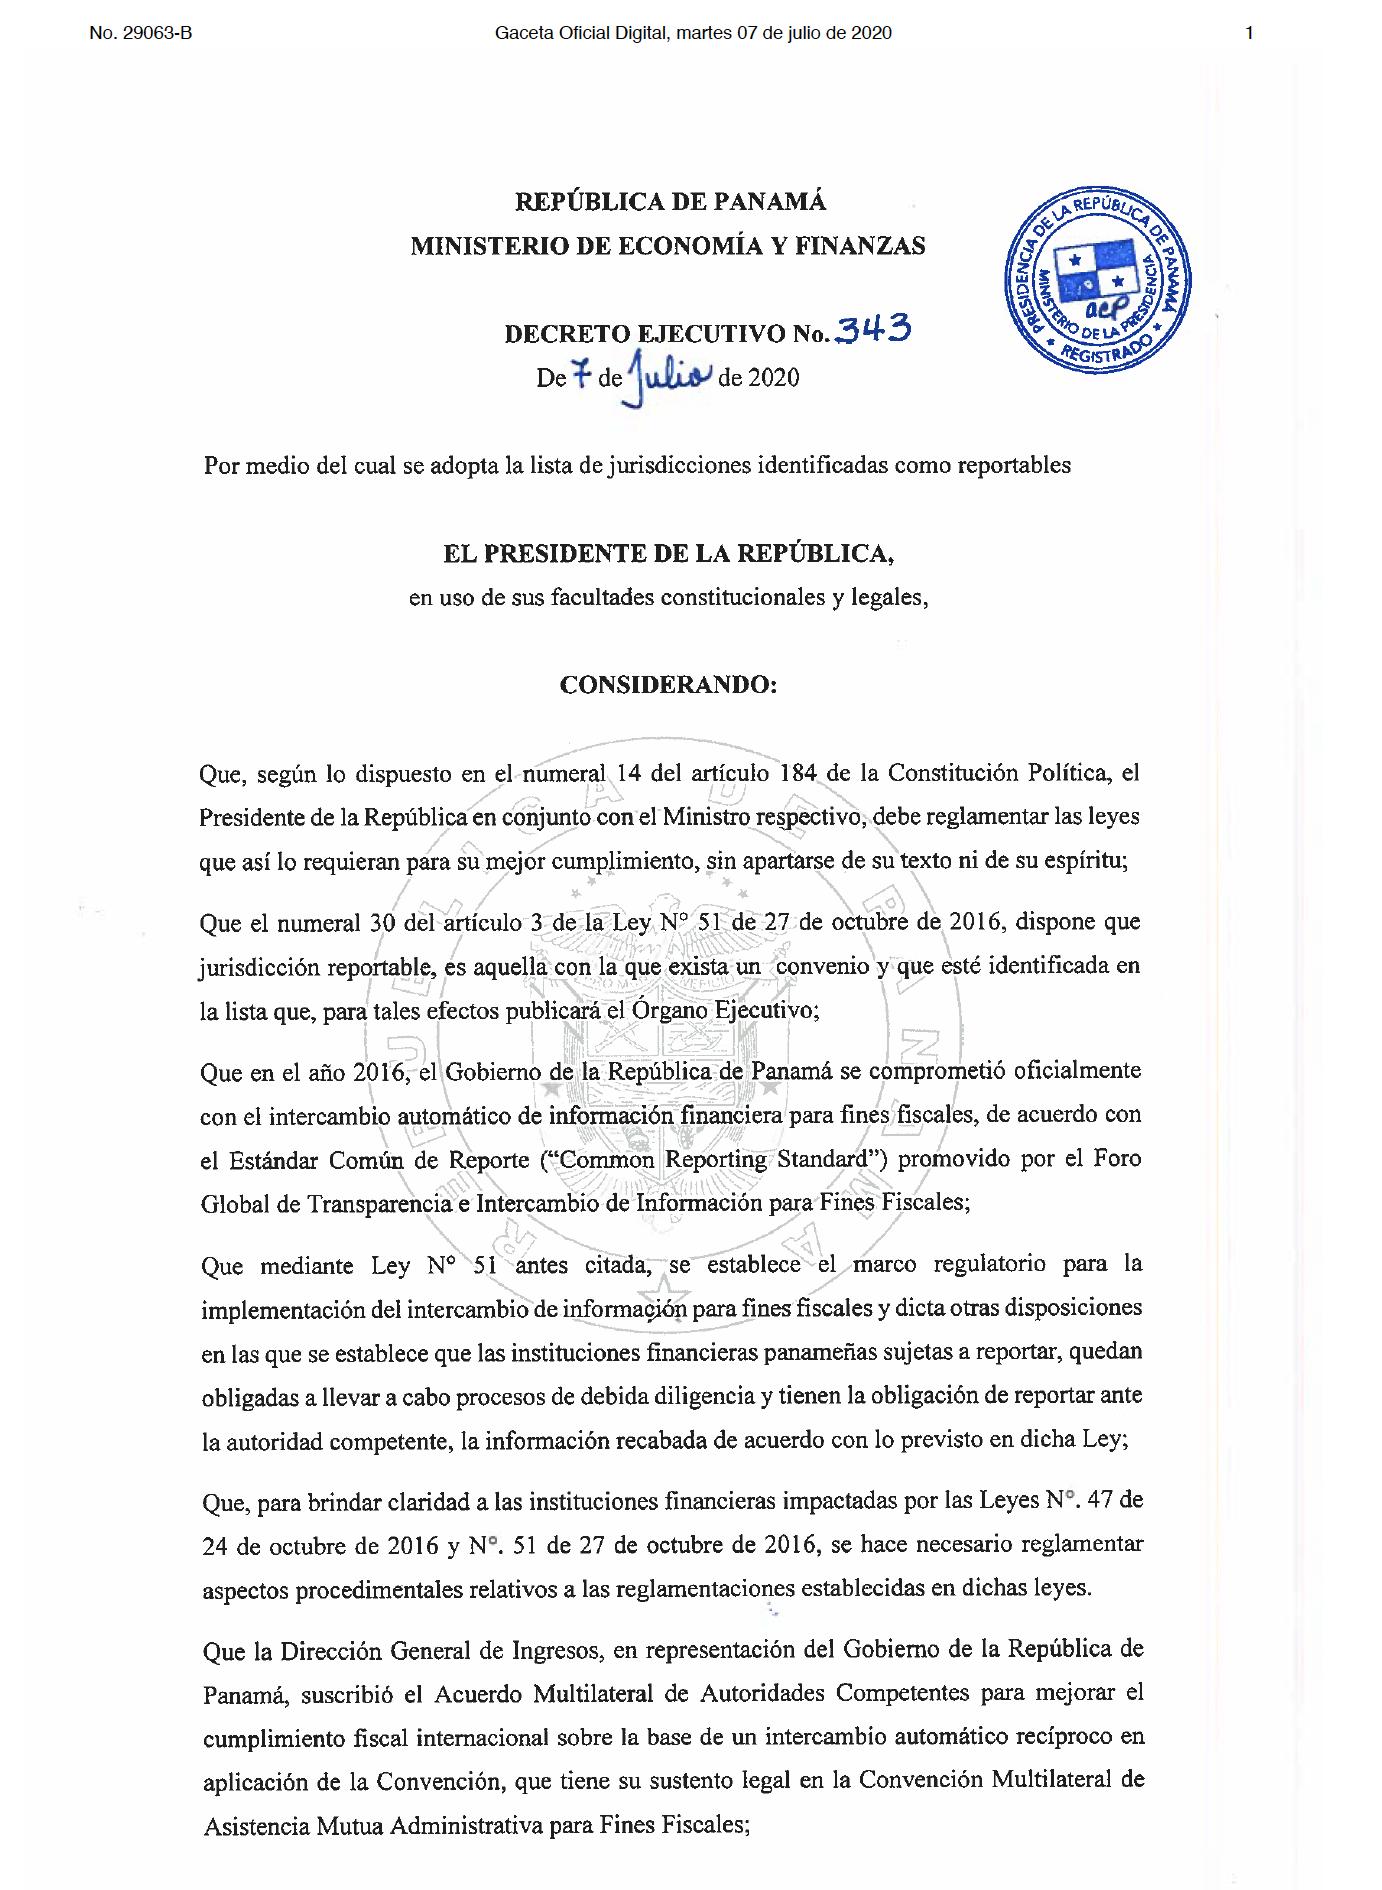 Decreto Ejecutivo No. 343 de 7 de julio de 2020